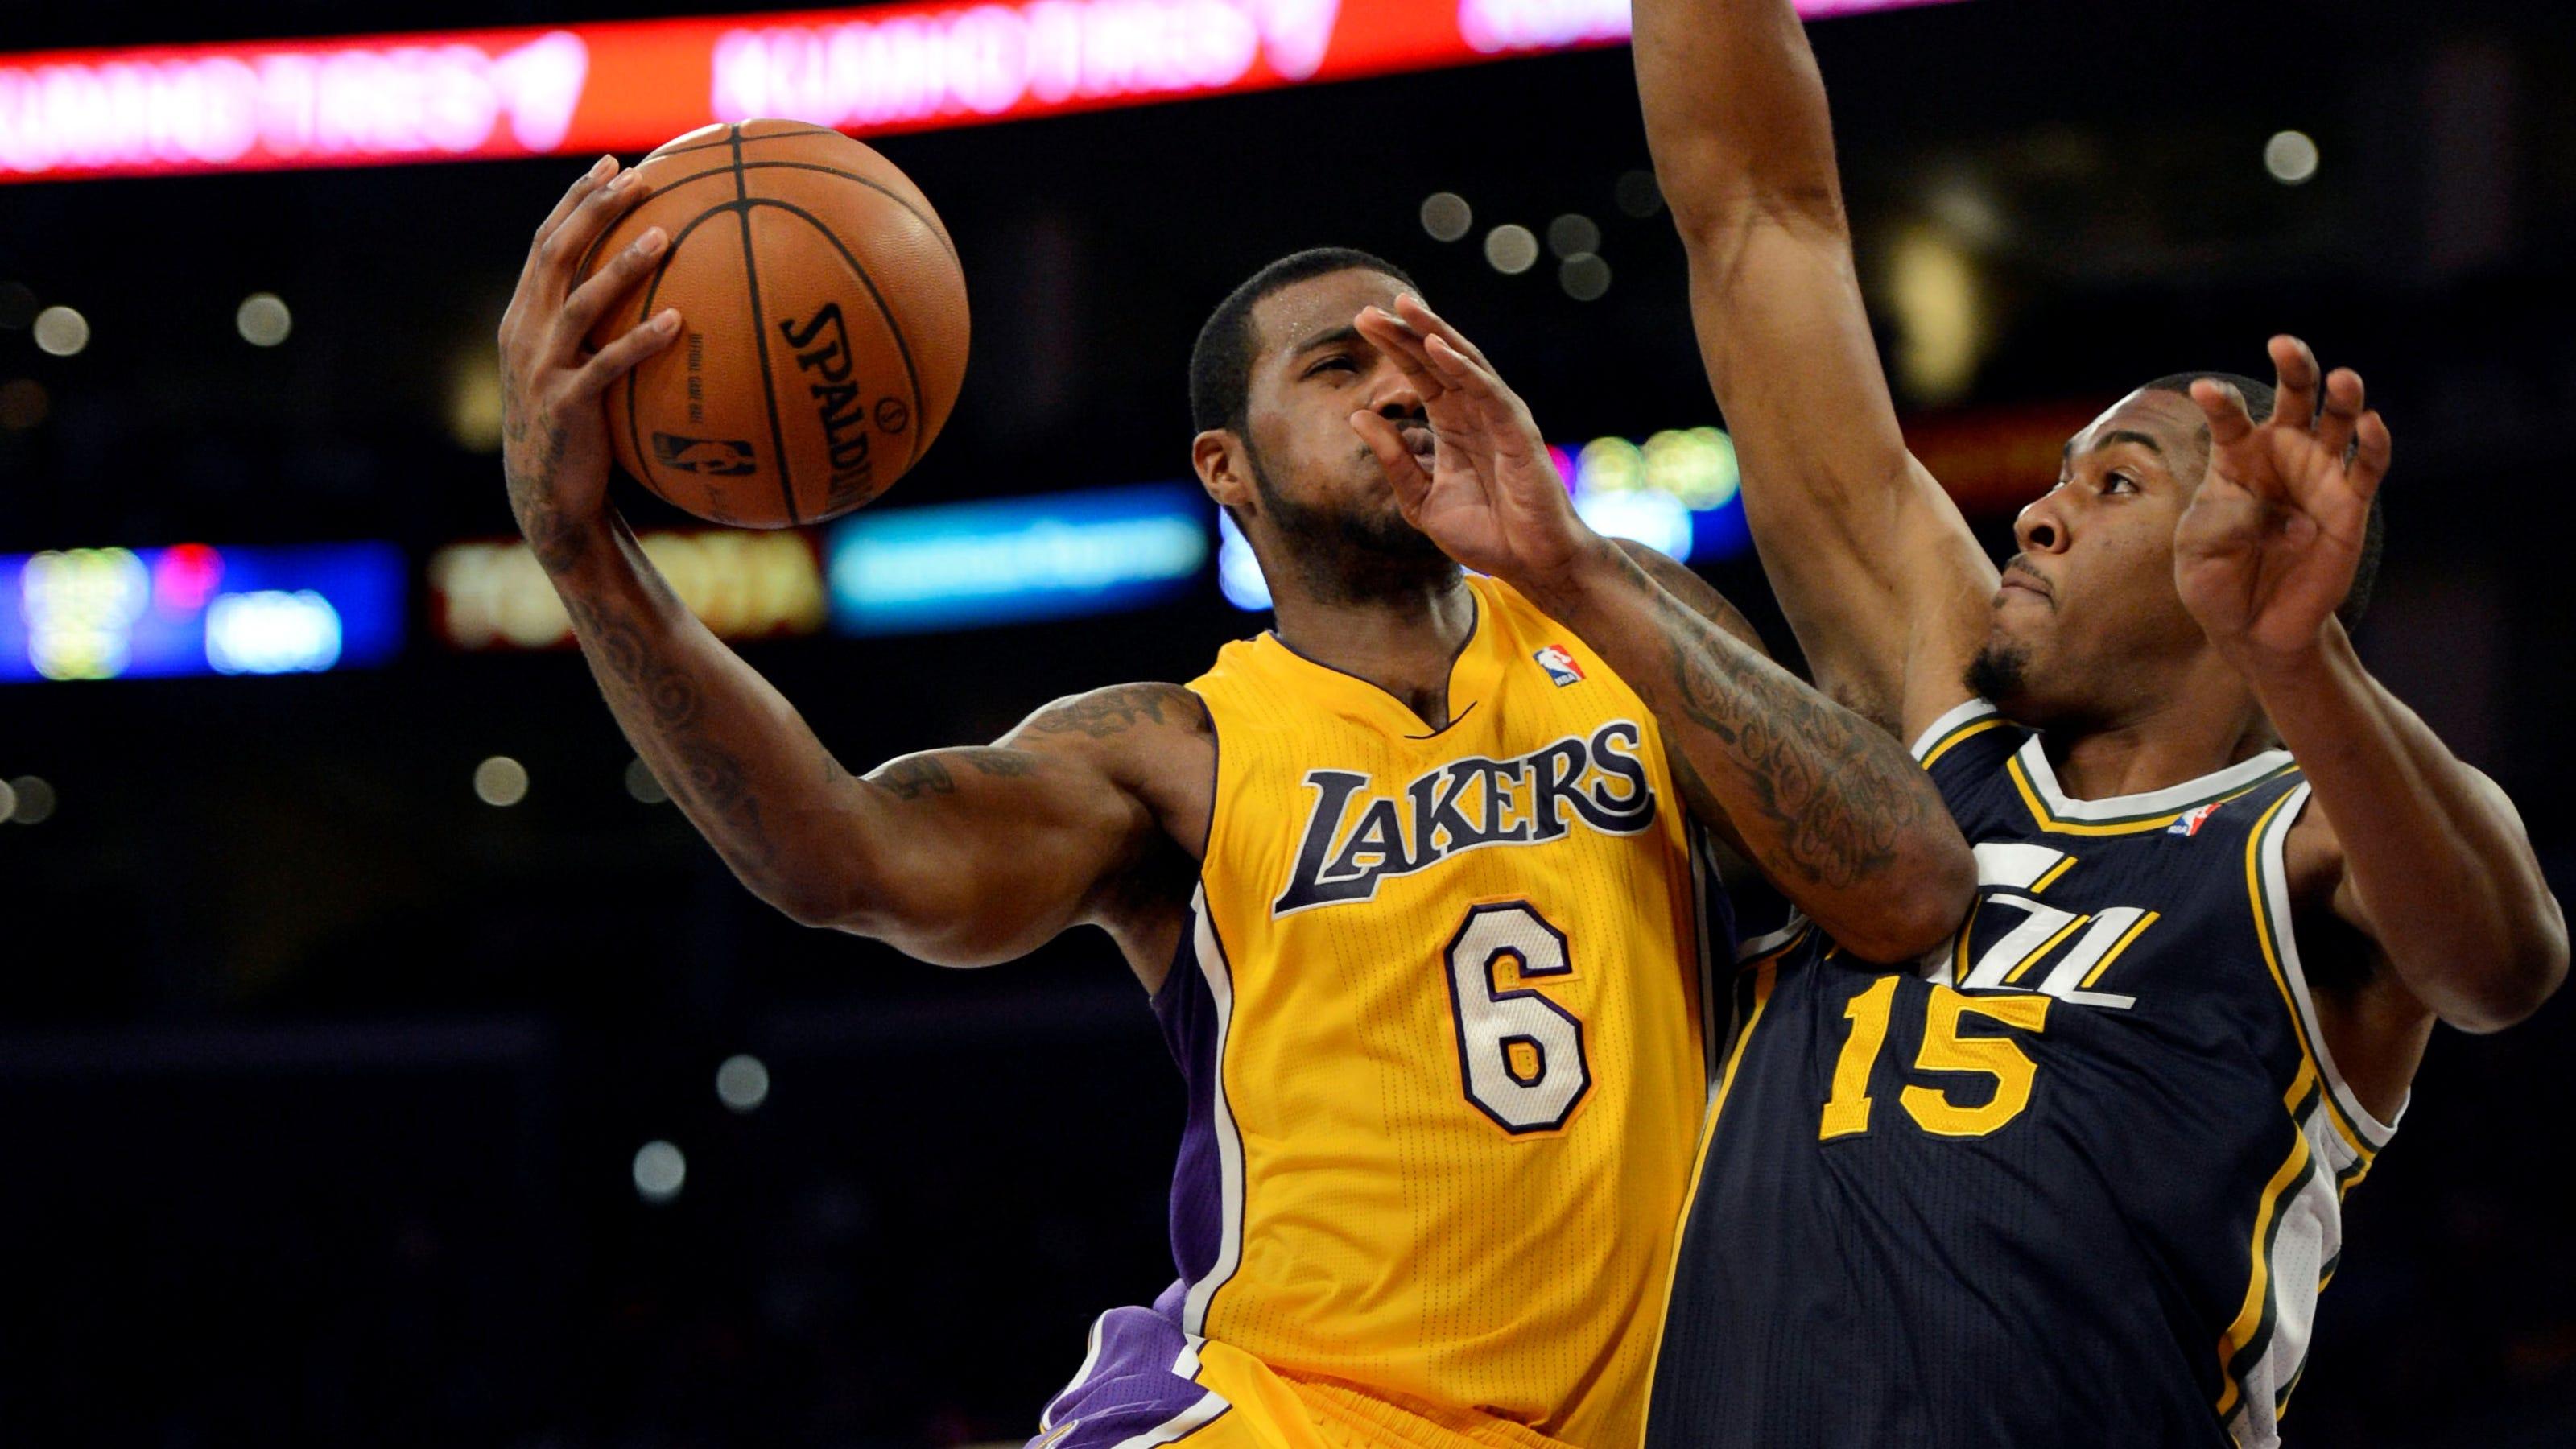 Playoff Games Tonight Nba | All Basketball Scores Info